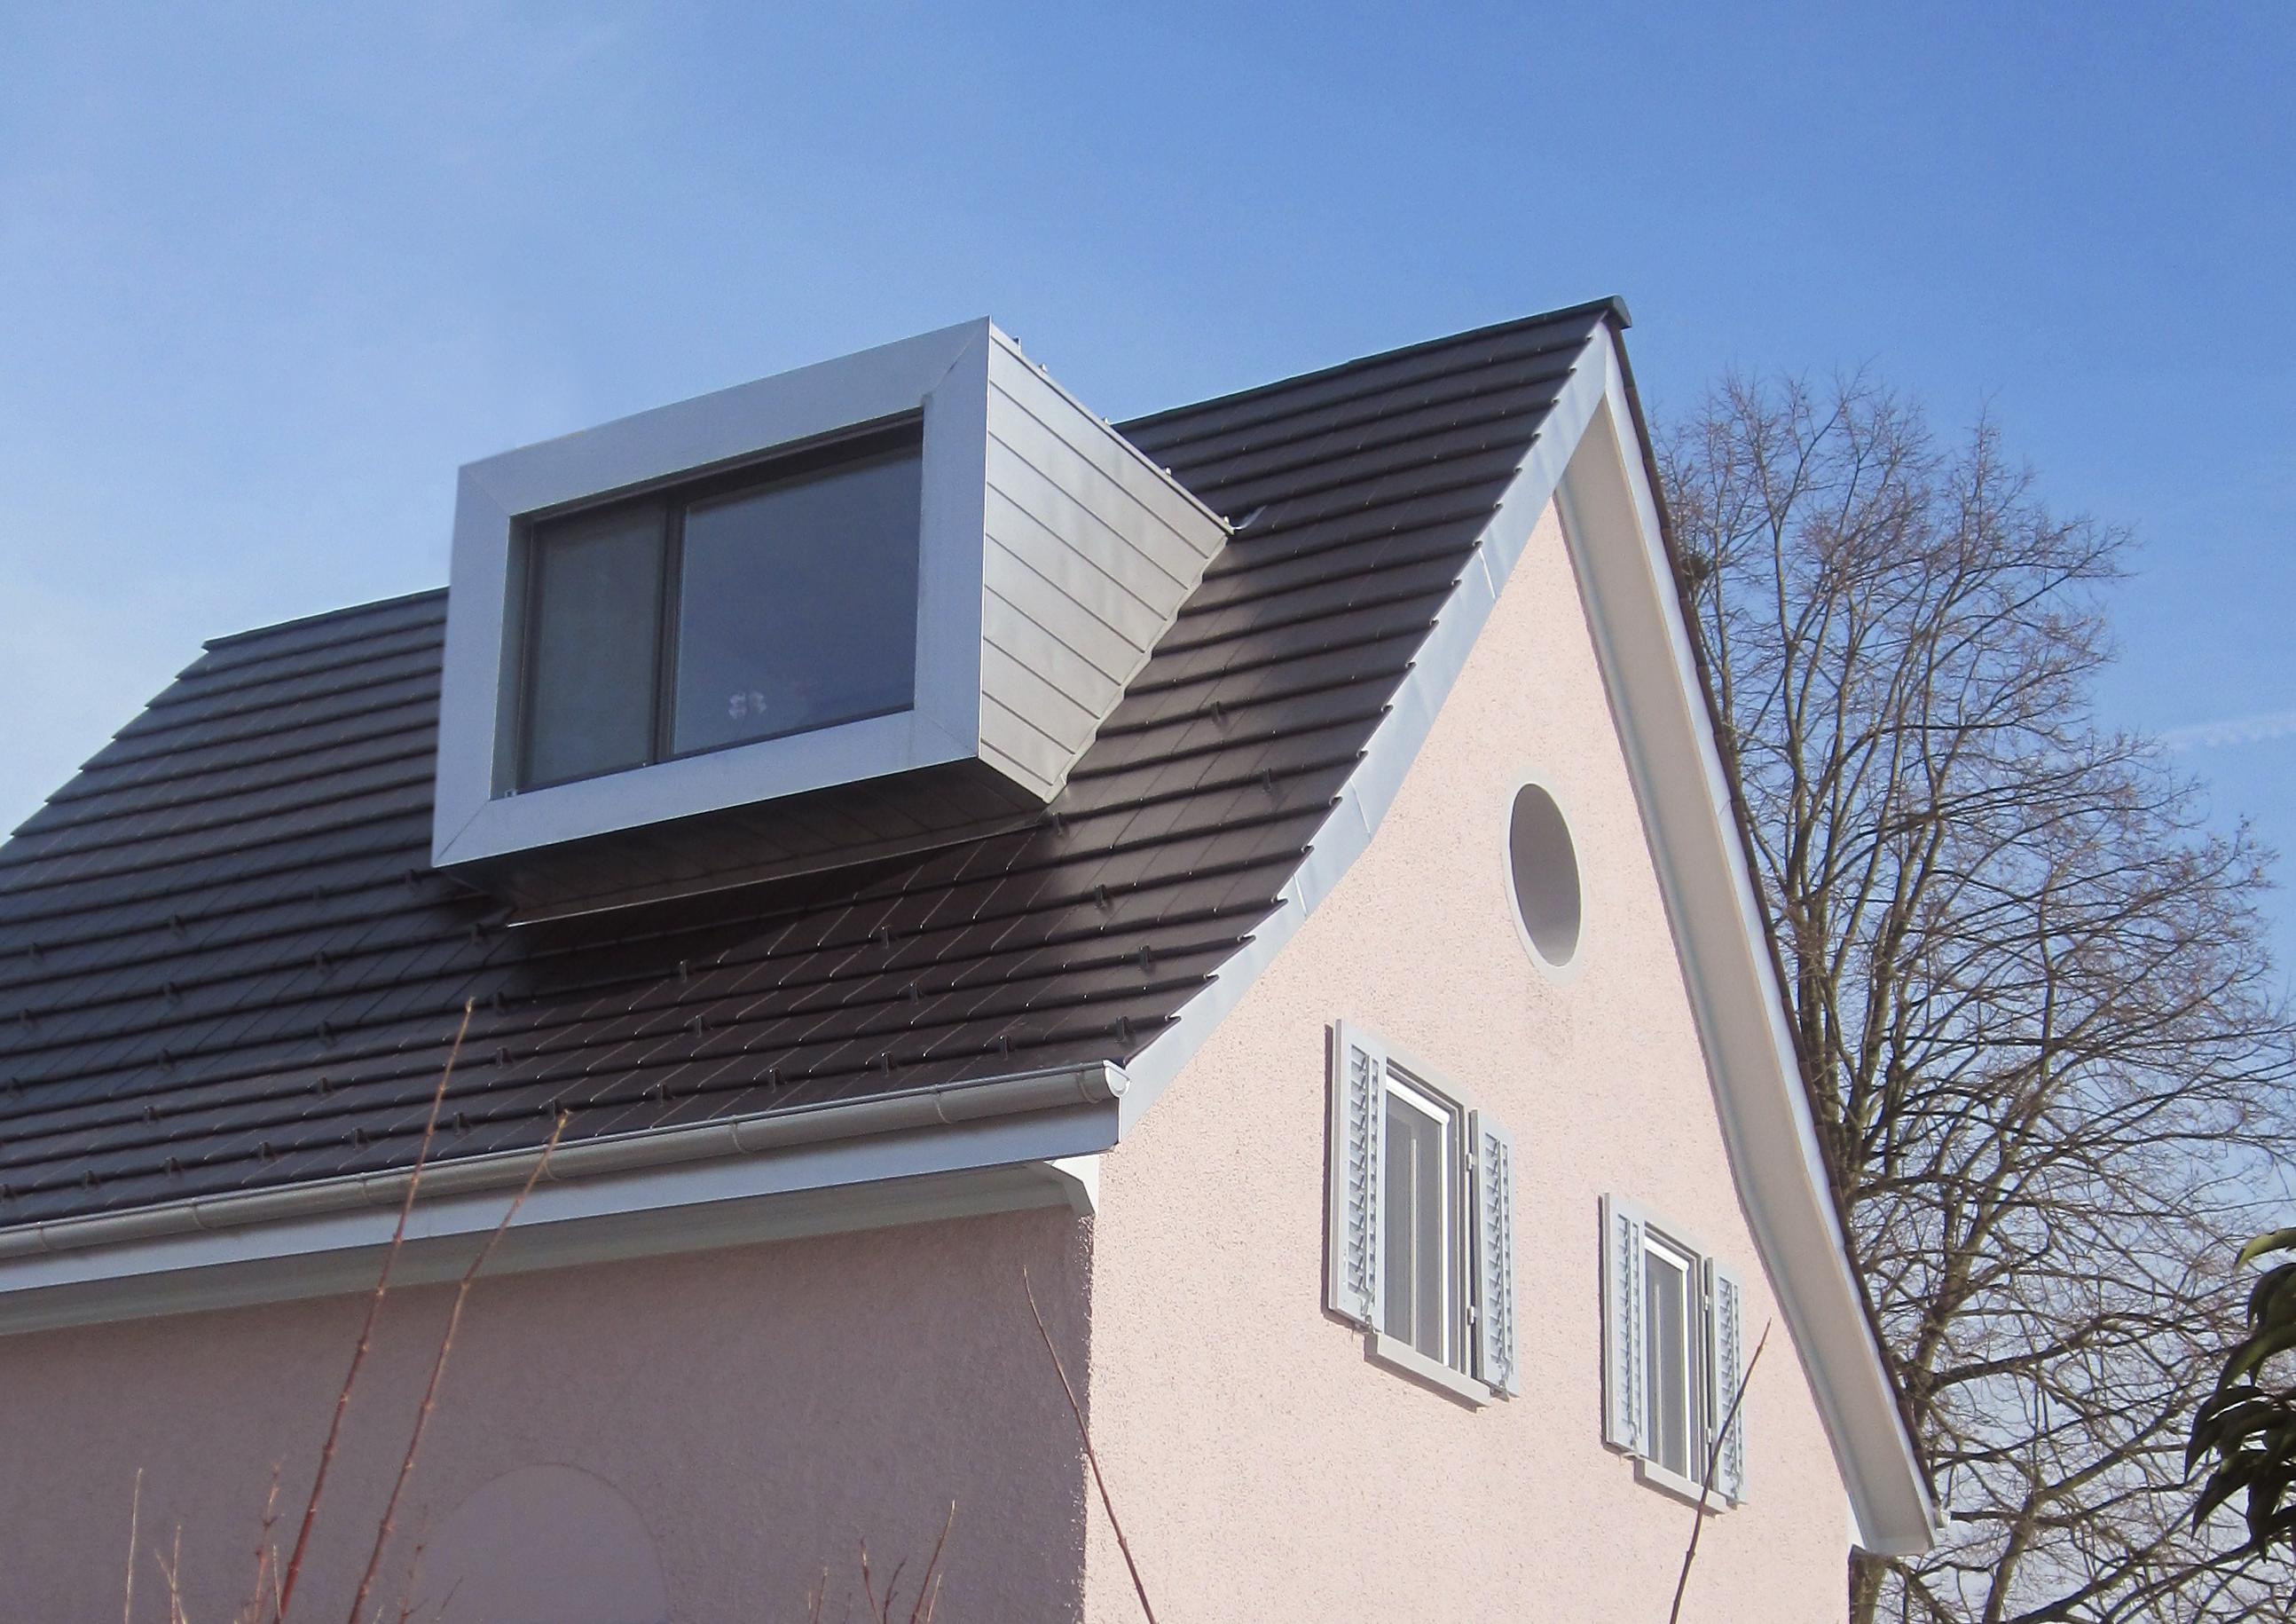 Architektur efh fislisbach innenarchitektur leitgedanke for Design innenarchitektur